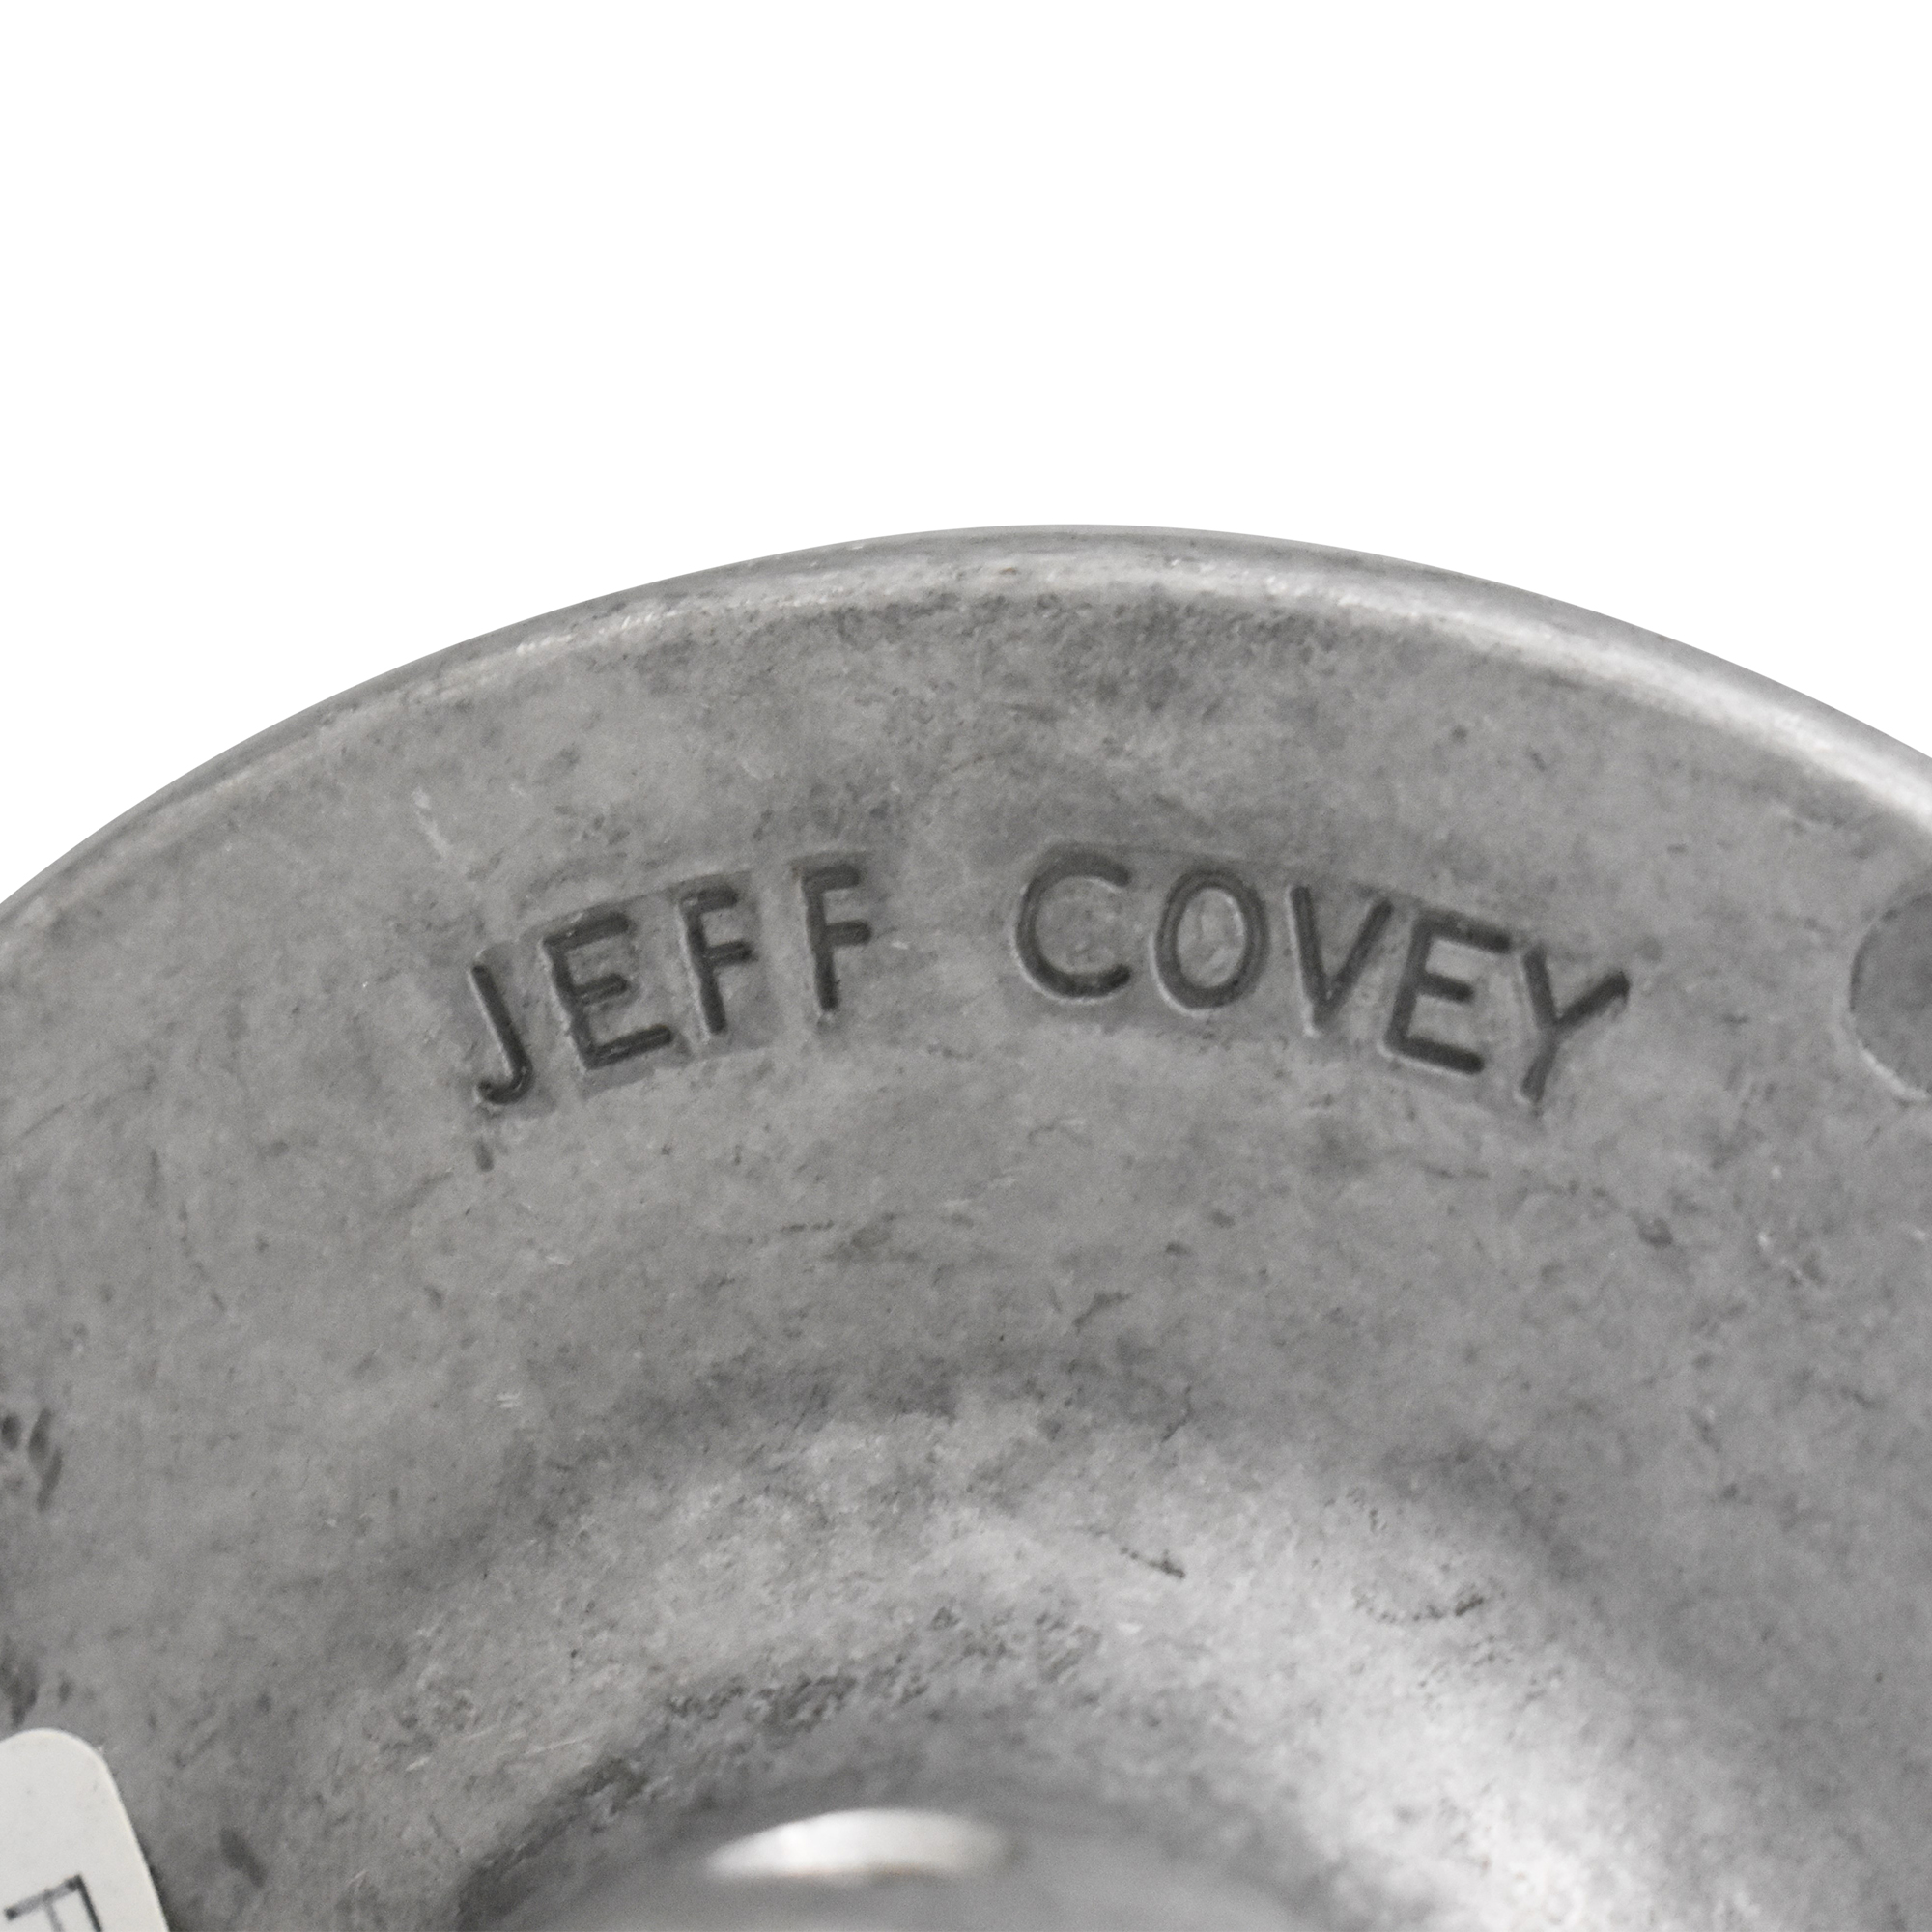 Herman Miller Herman Miller Jeff Covey Model 6 Stools ma